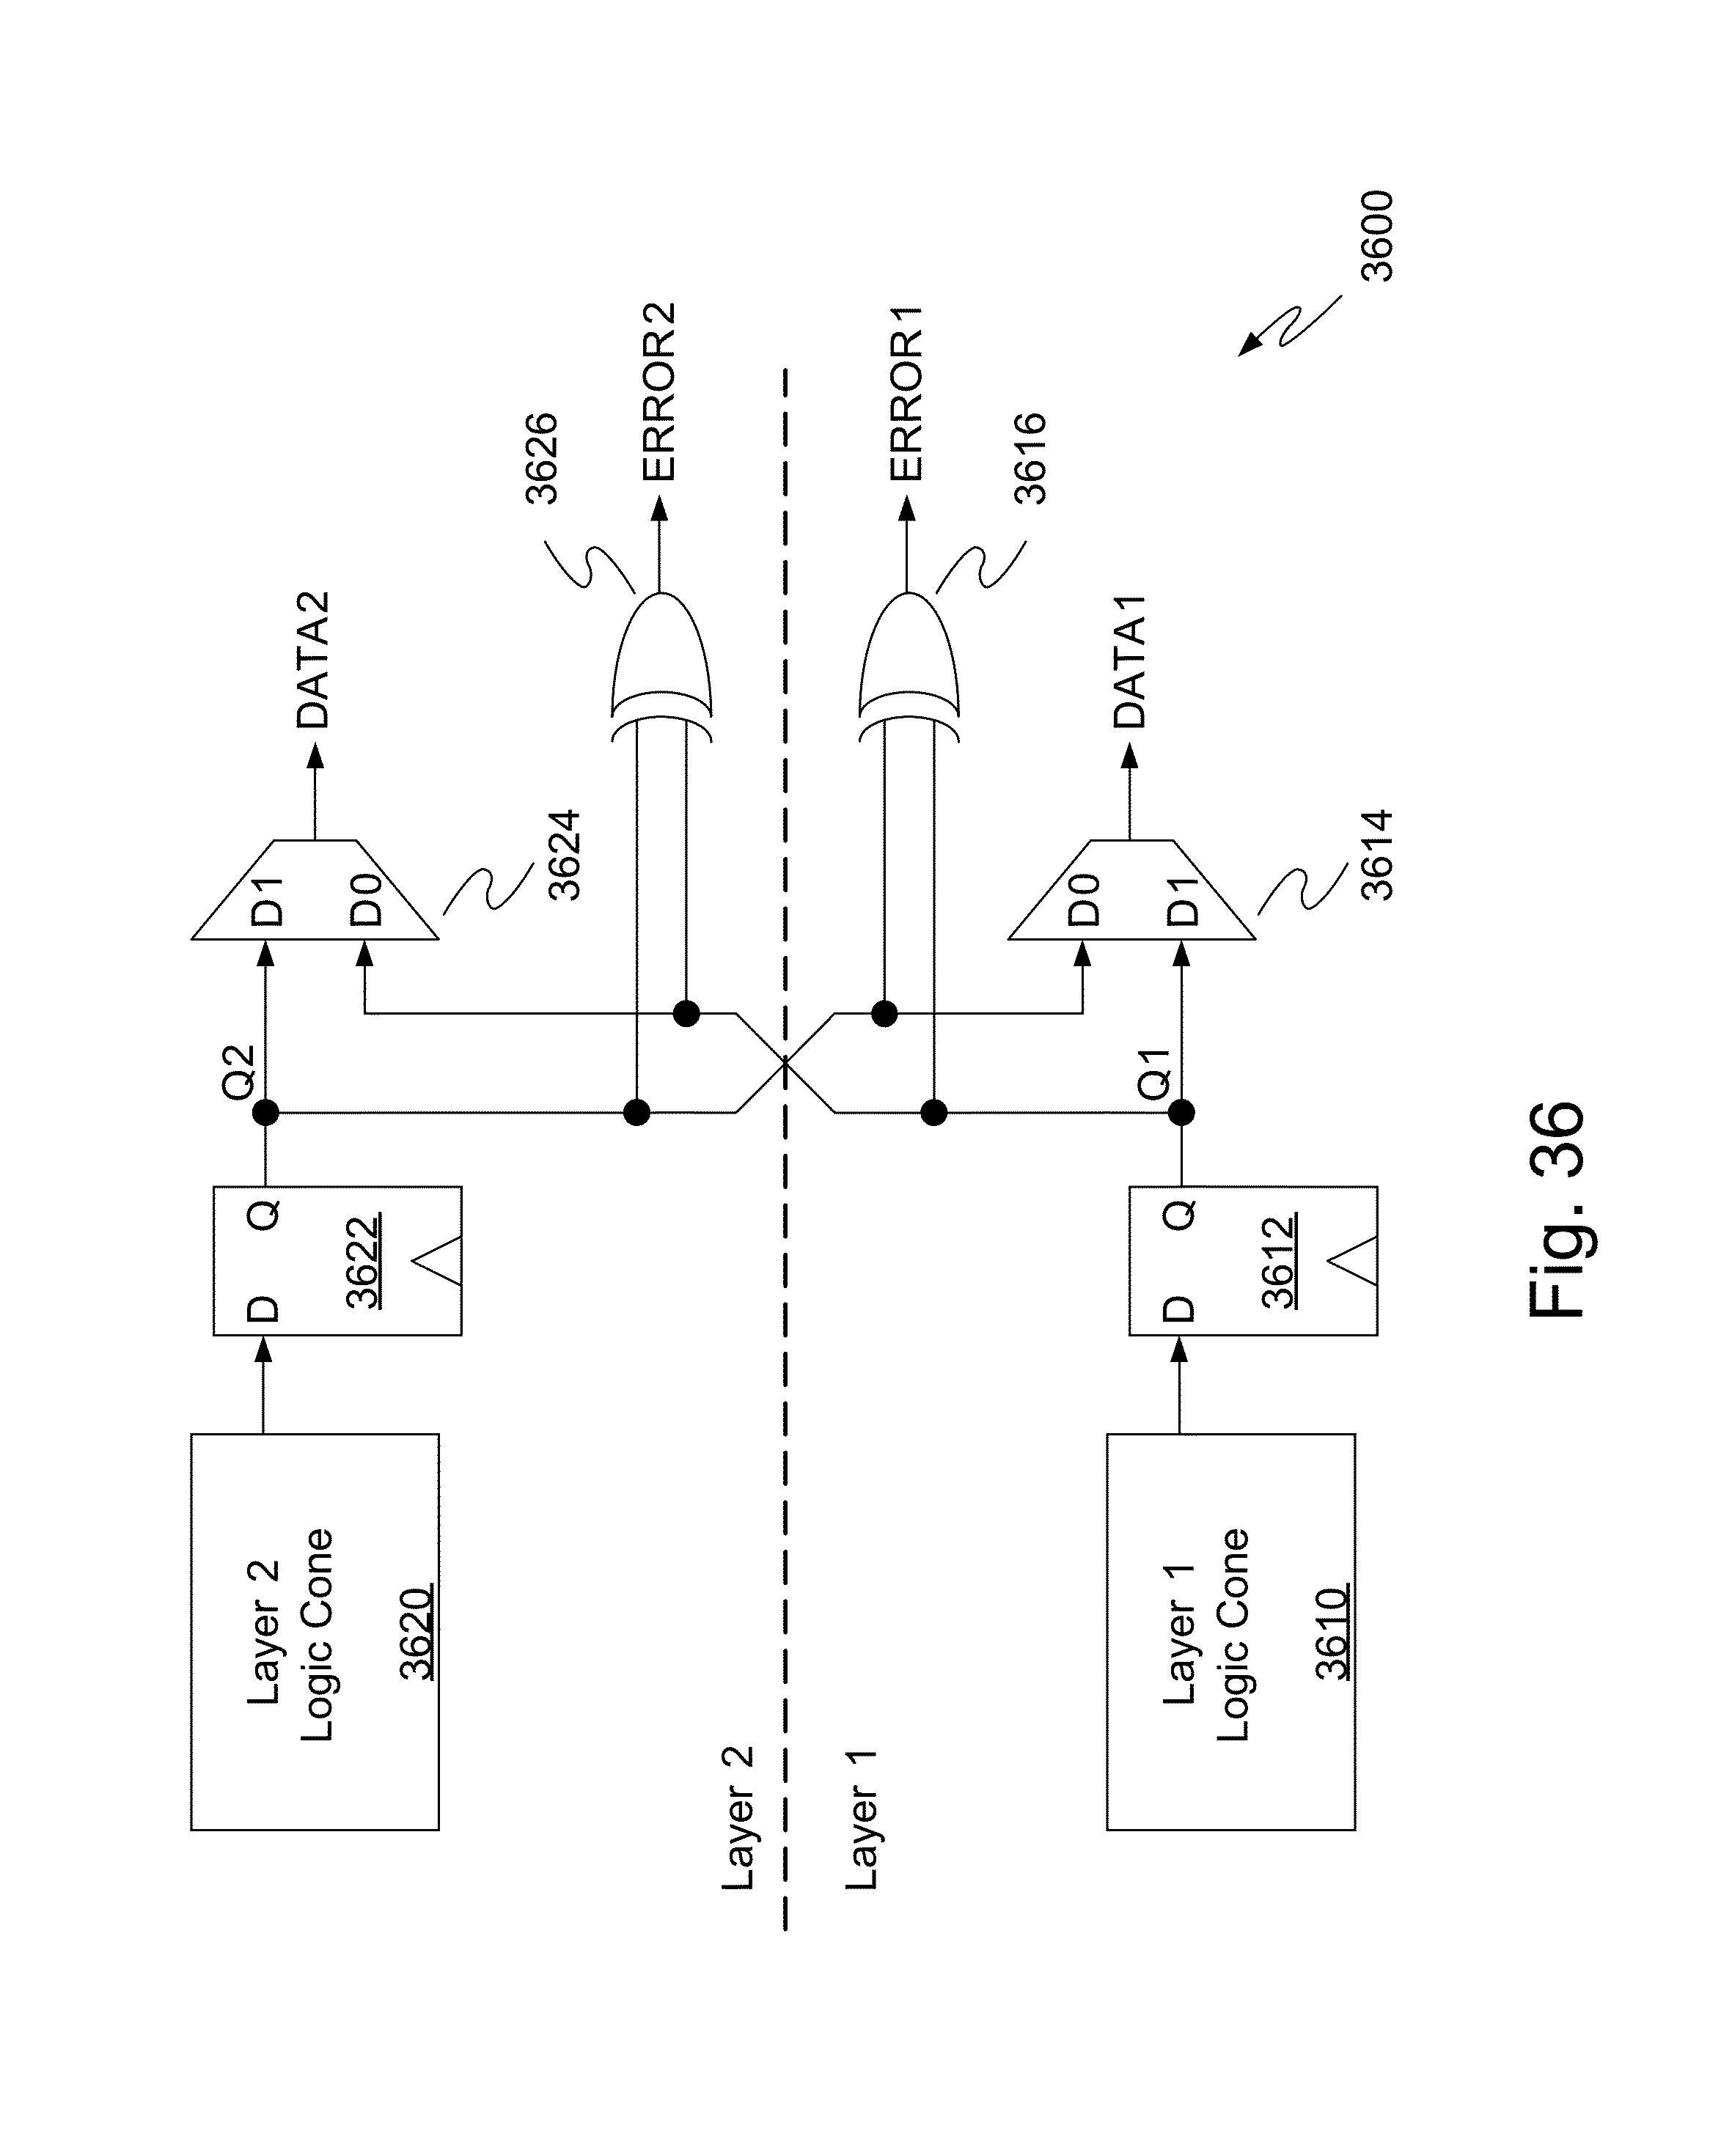 Noise Generator Circuit Diagram Tradeoficcom Wiring Audible Turn Signal Simple Timer Household Schema